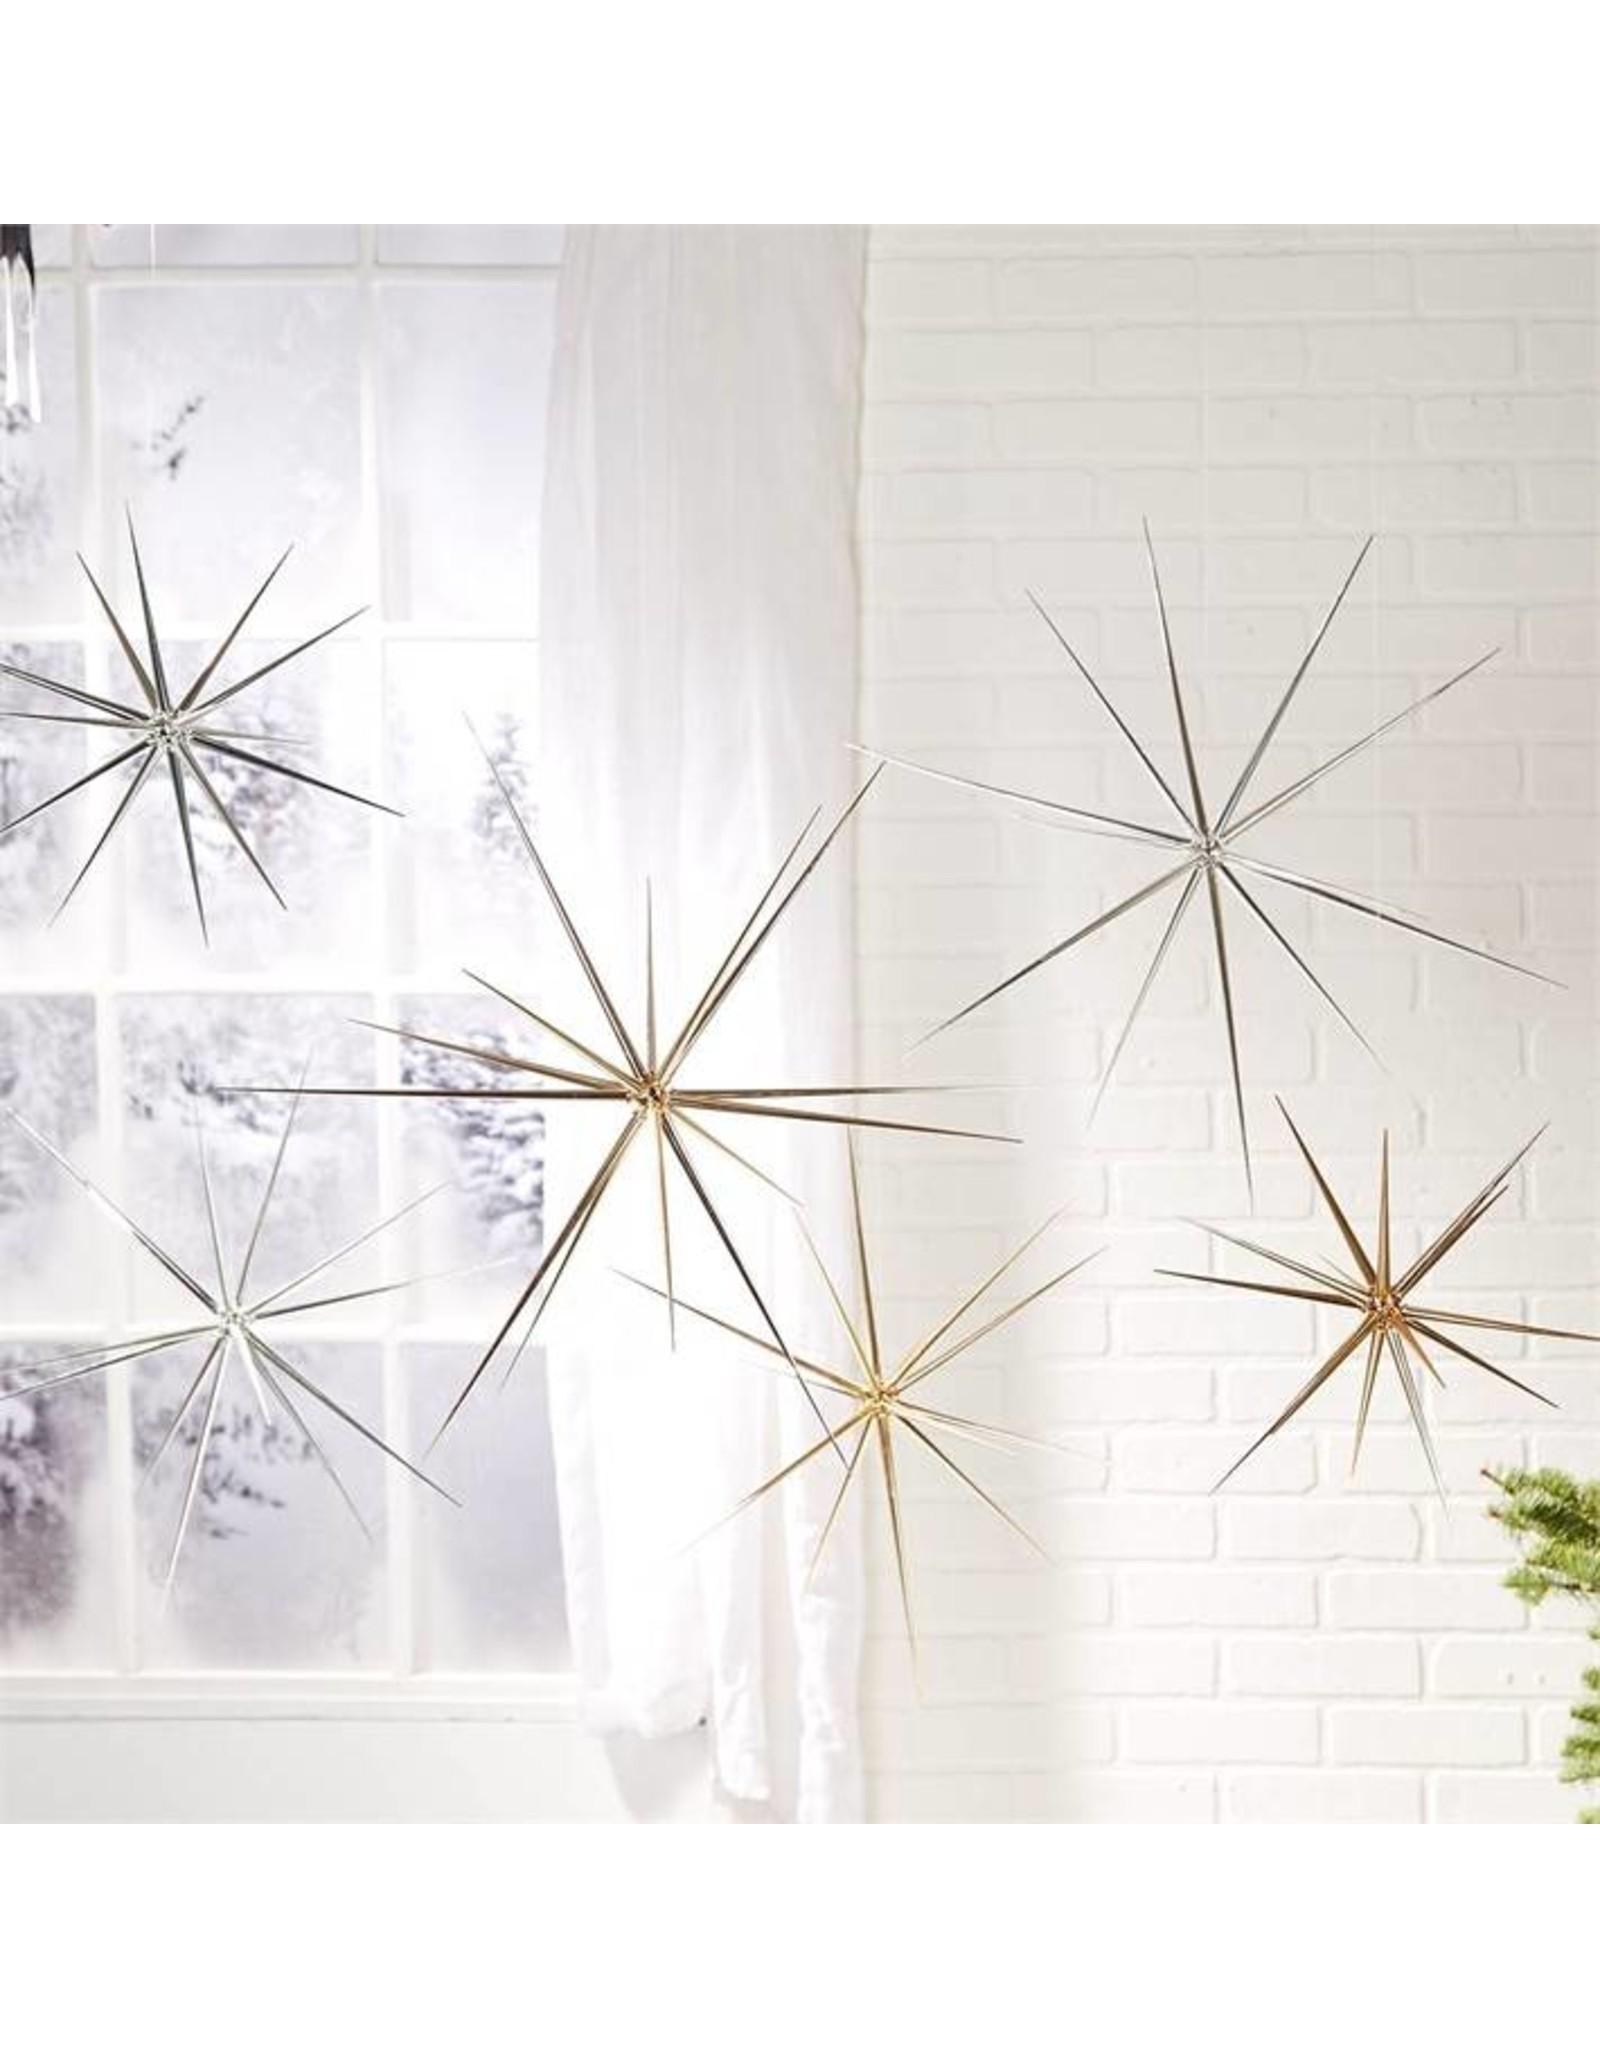 Small Starburst Ornament